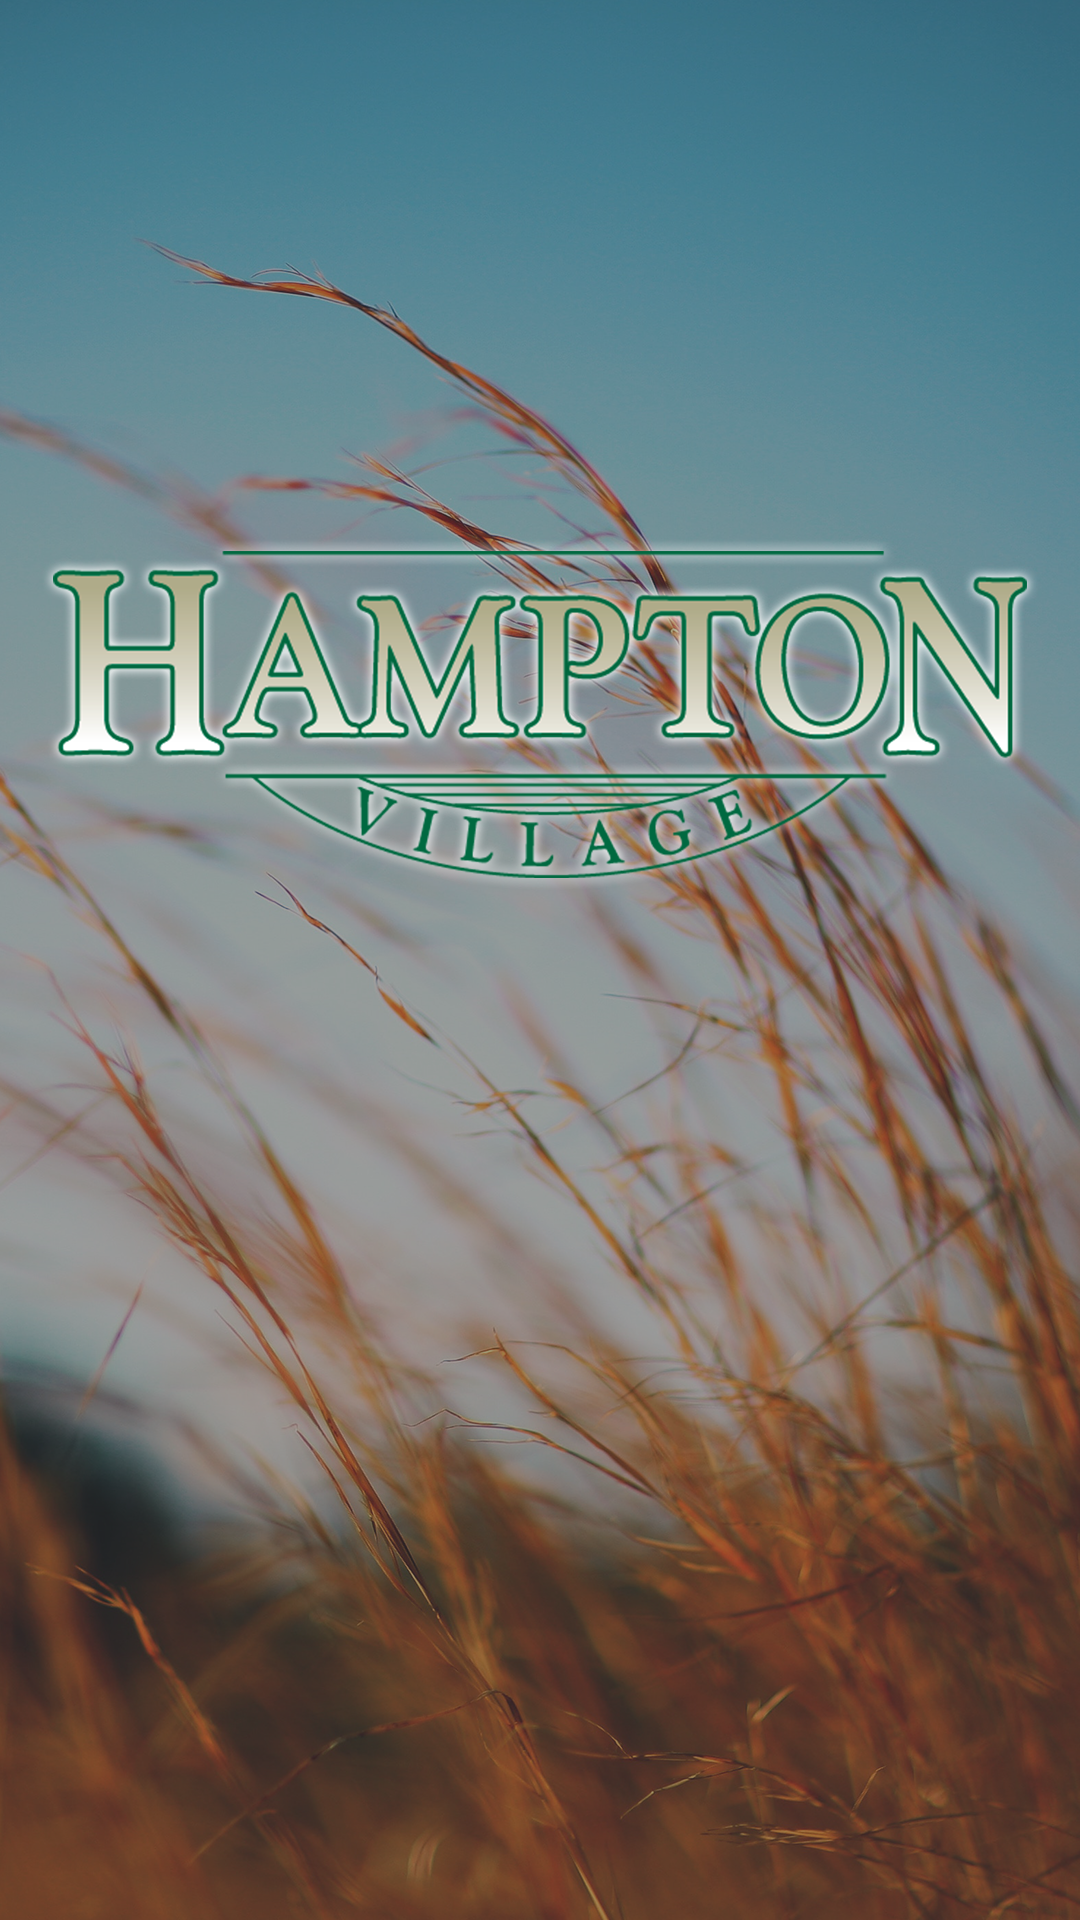 Hampton Village.png